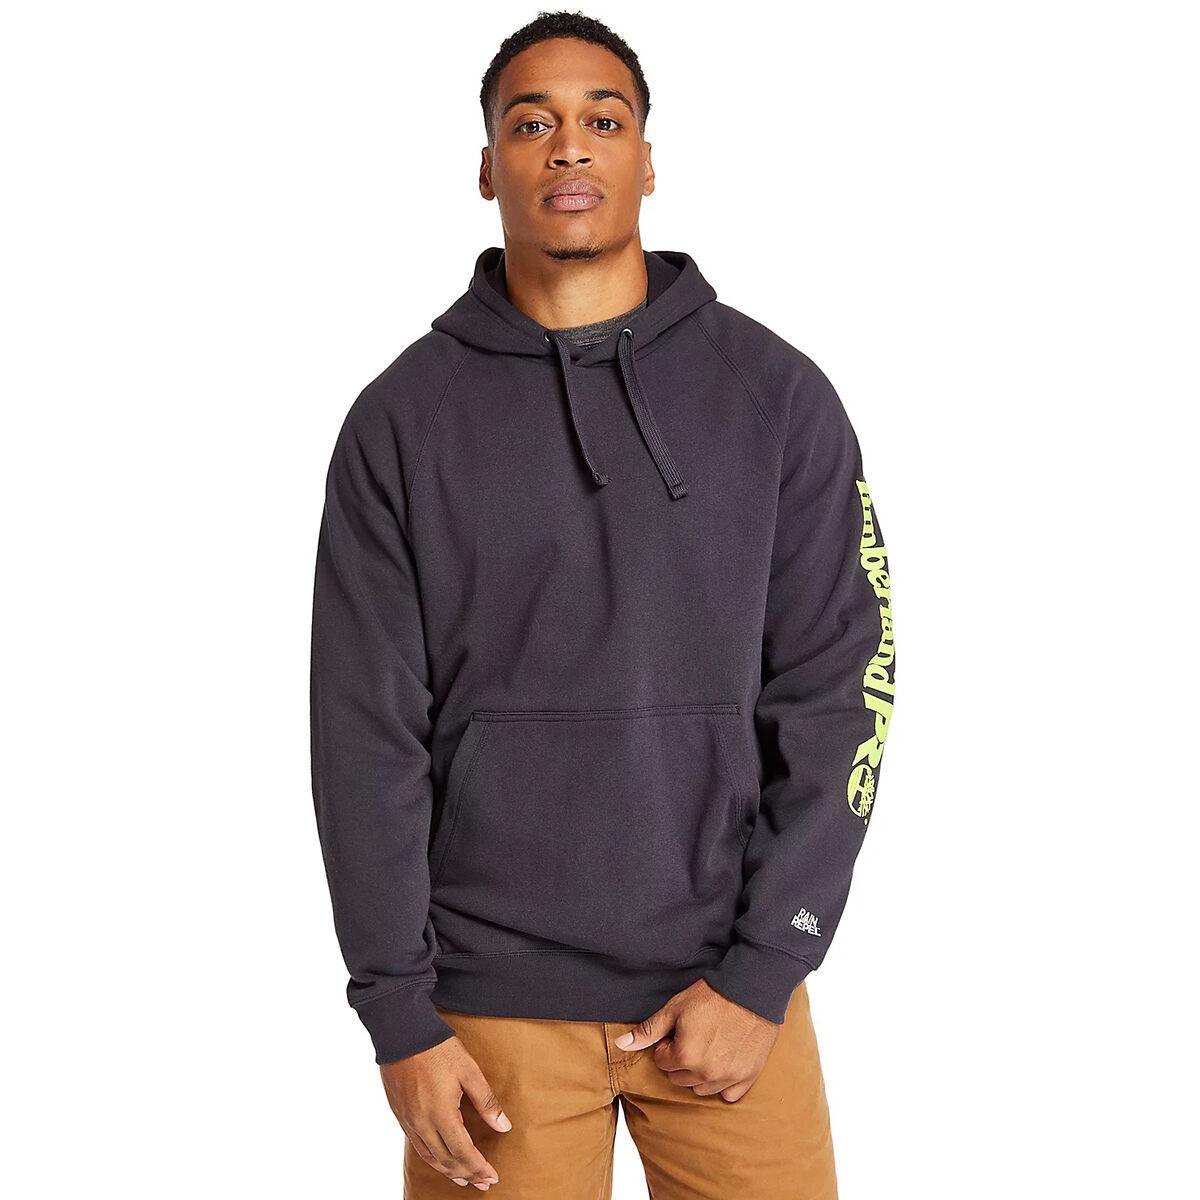 Timberland Pro Men's Hood Honcho Sport Pullover Hoodie